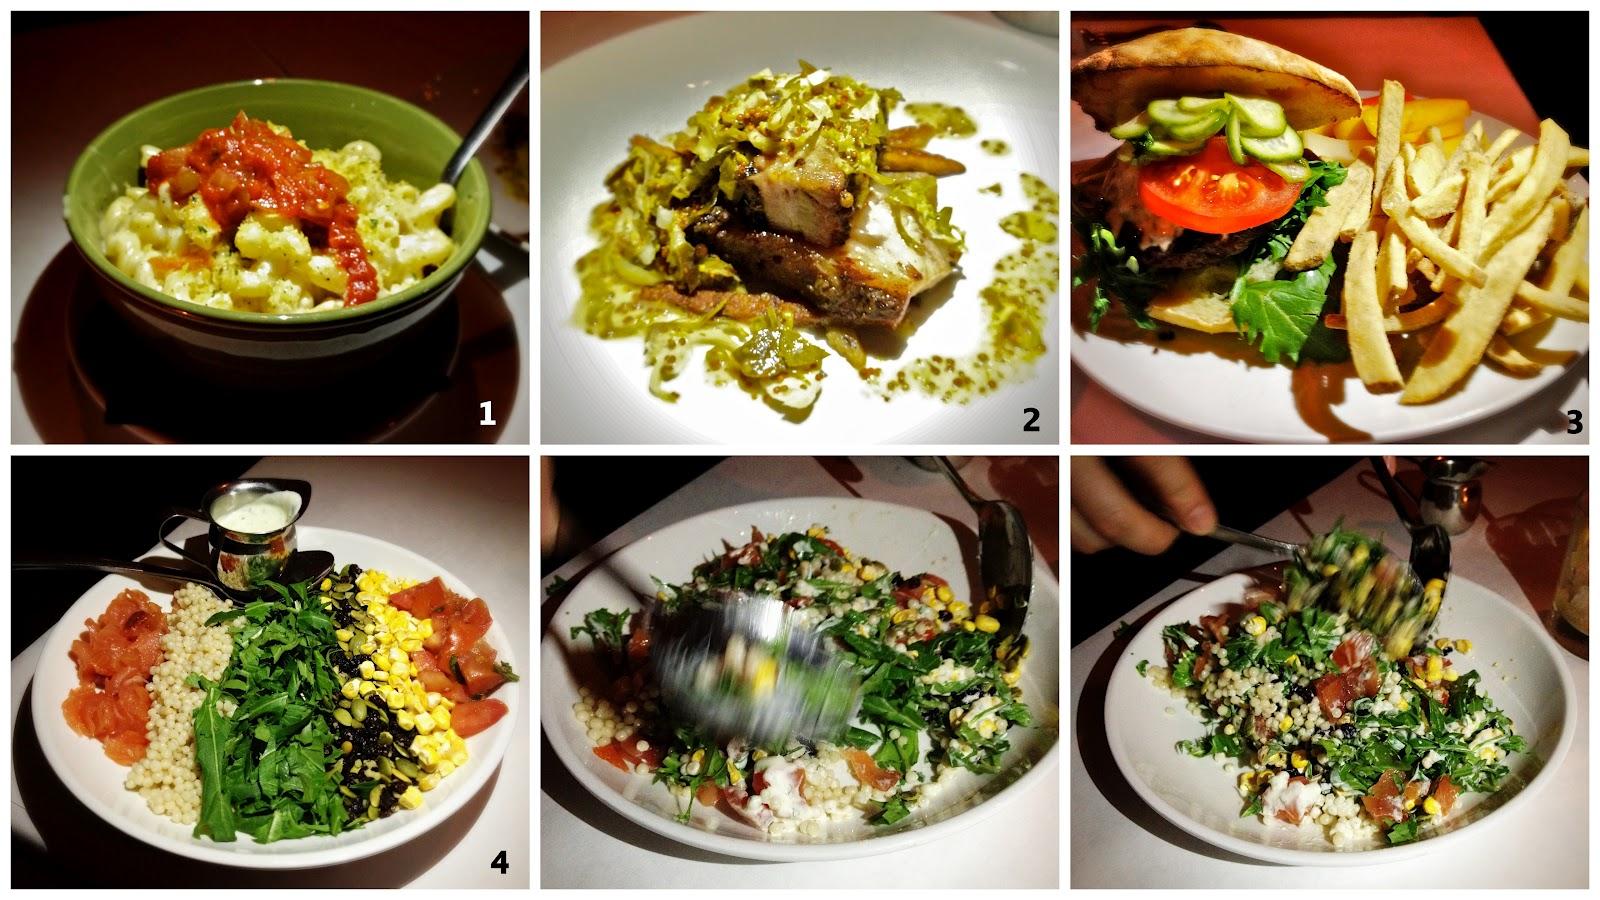 Citizen Public House Cuisine: New American/Gastropub Price Range: Starters  $9 $13, Burgers $13, Entrees $20 $32. Address: 7111 E 5th Ave Ste E,  Scottsdale, ...